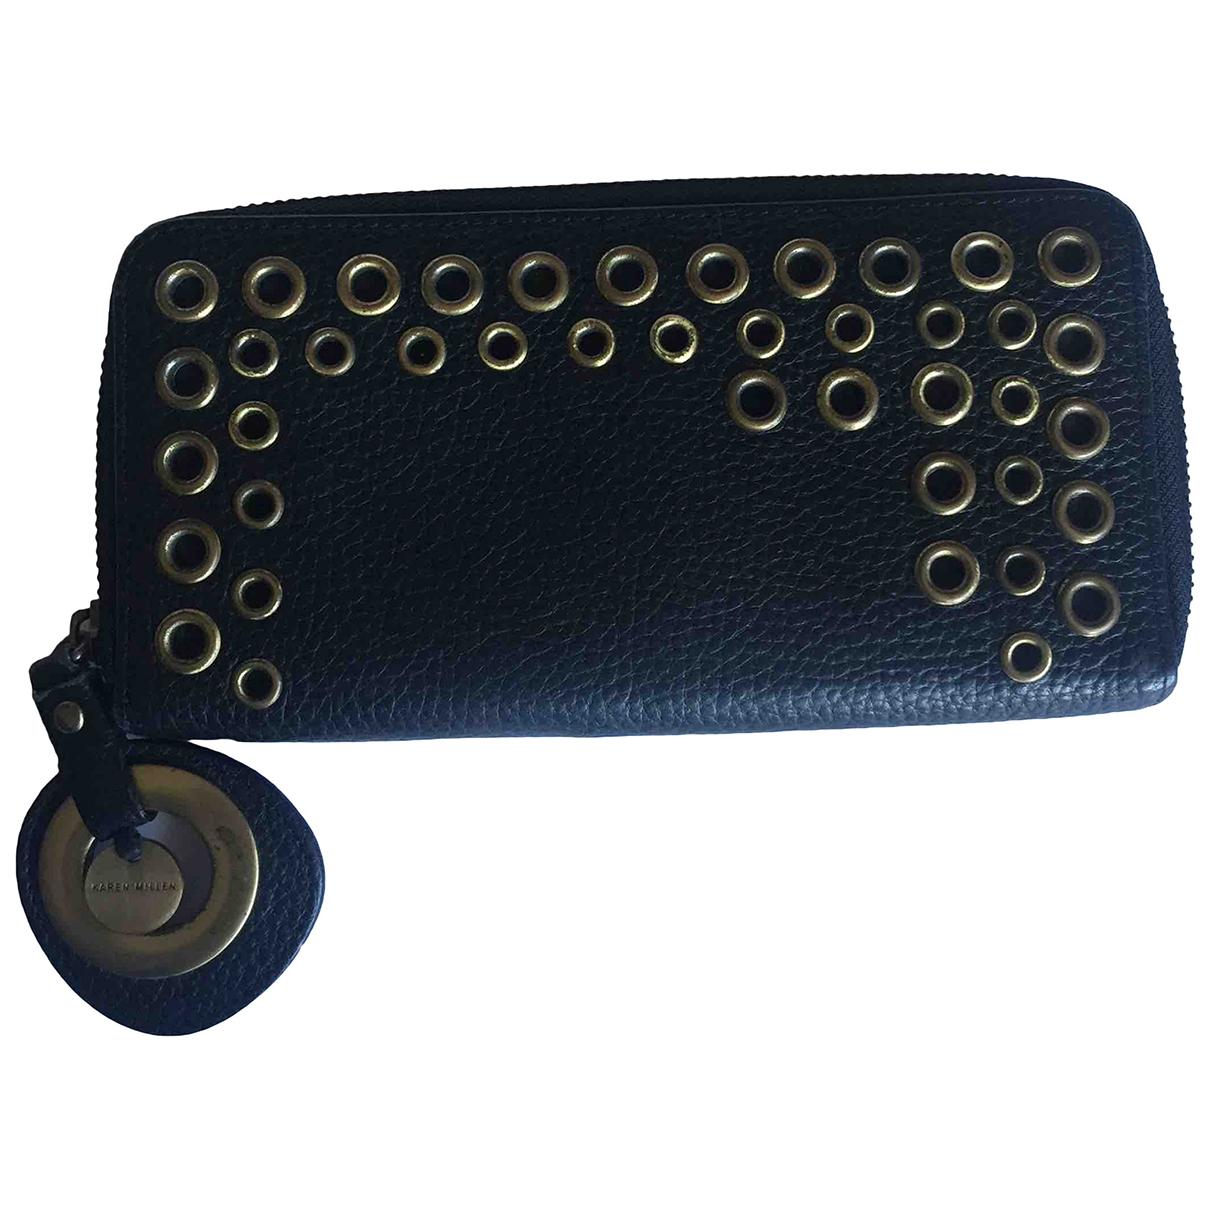 Karen Millen - Portefeuille   pour femme en cuir - noir